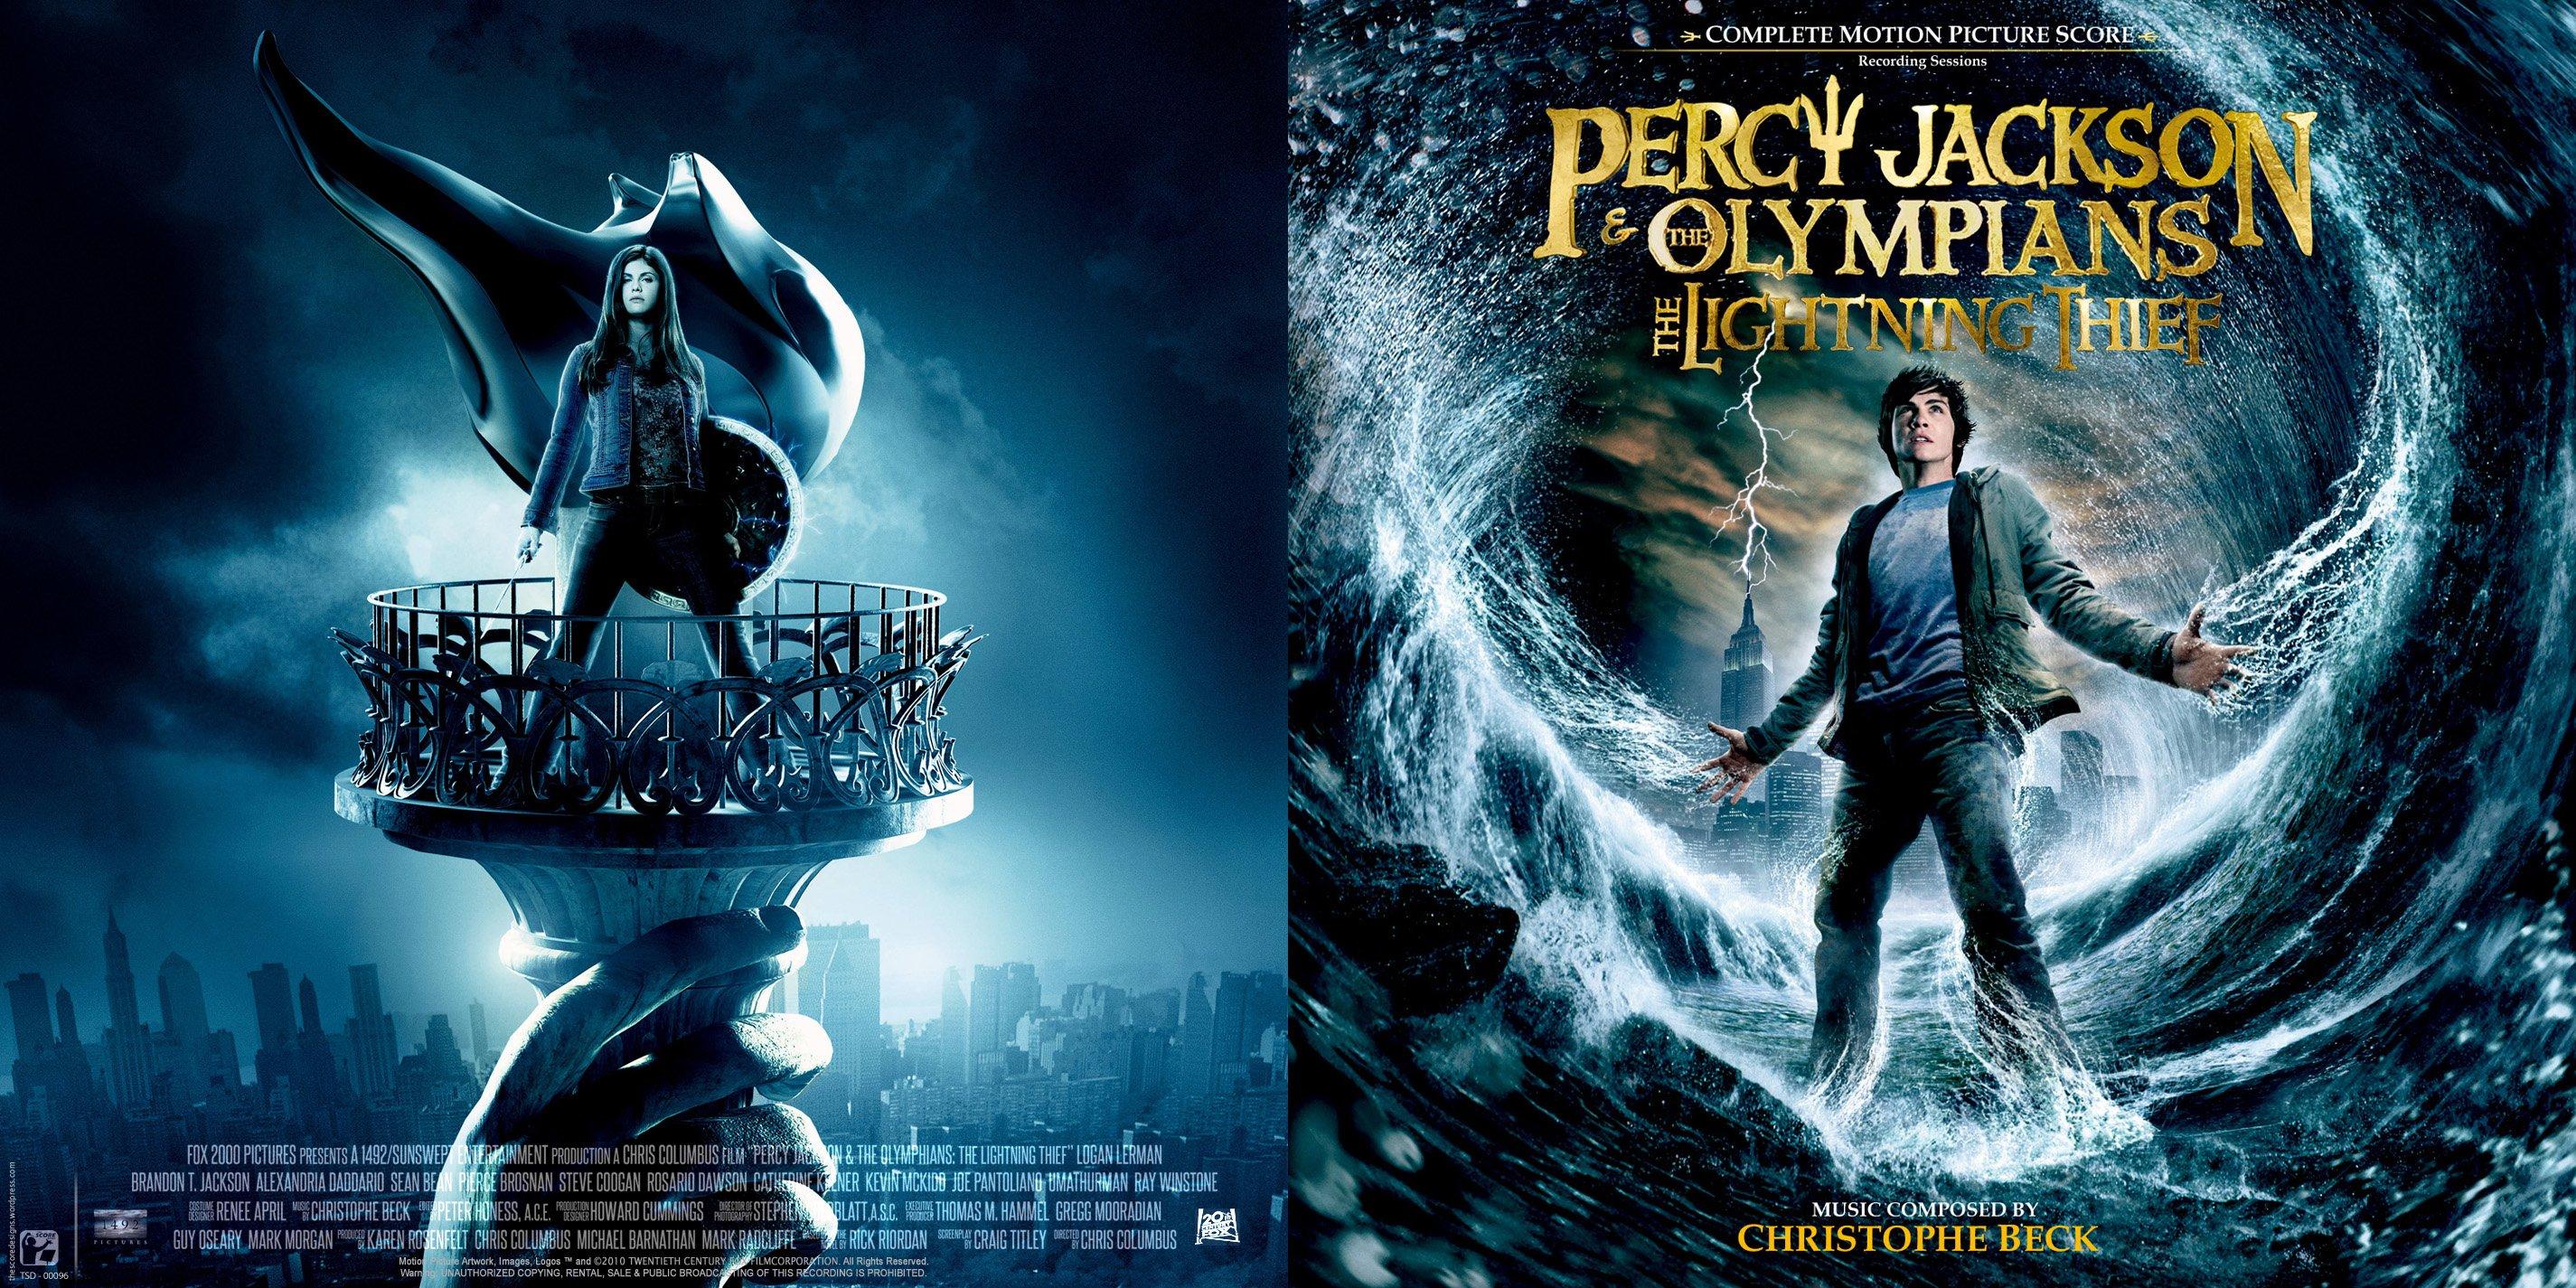 Percy Jackson Olympians Lightning Thief fantasy adventure family gods 1pjolt poster wallpaper   2850x1425   810988   WallpaperUP